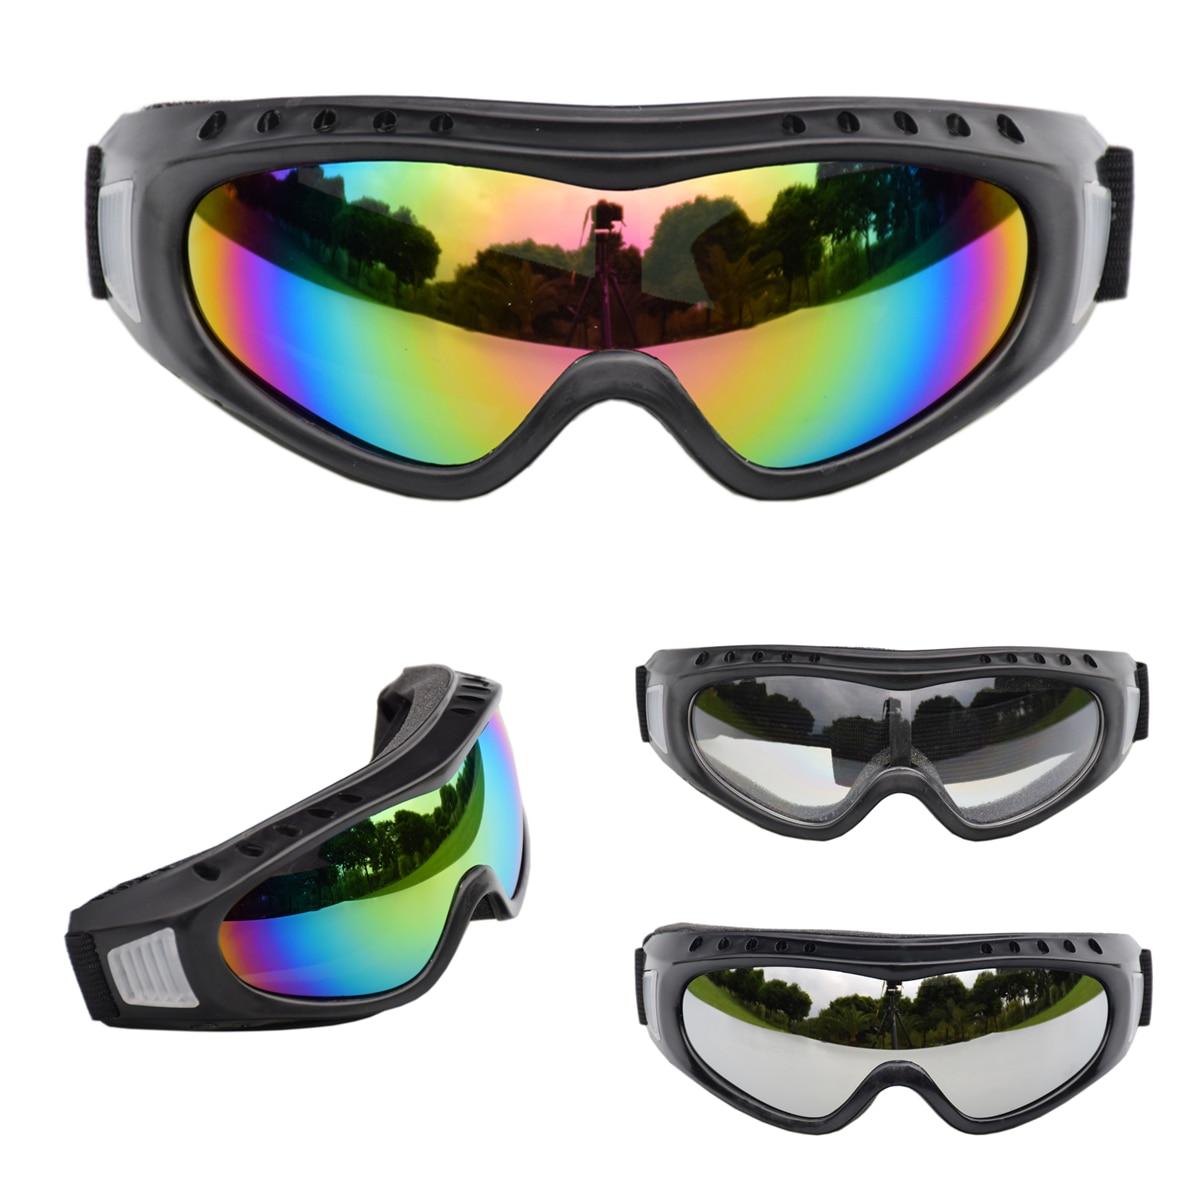 Ski Goggles Eyewear Anti-UV Windproof PC Lens Anti-fog Sand Protective Winter Youth Kids Sports Goggles Skiing Eyewear